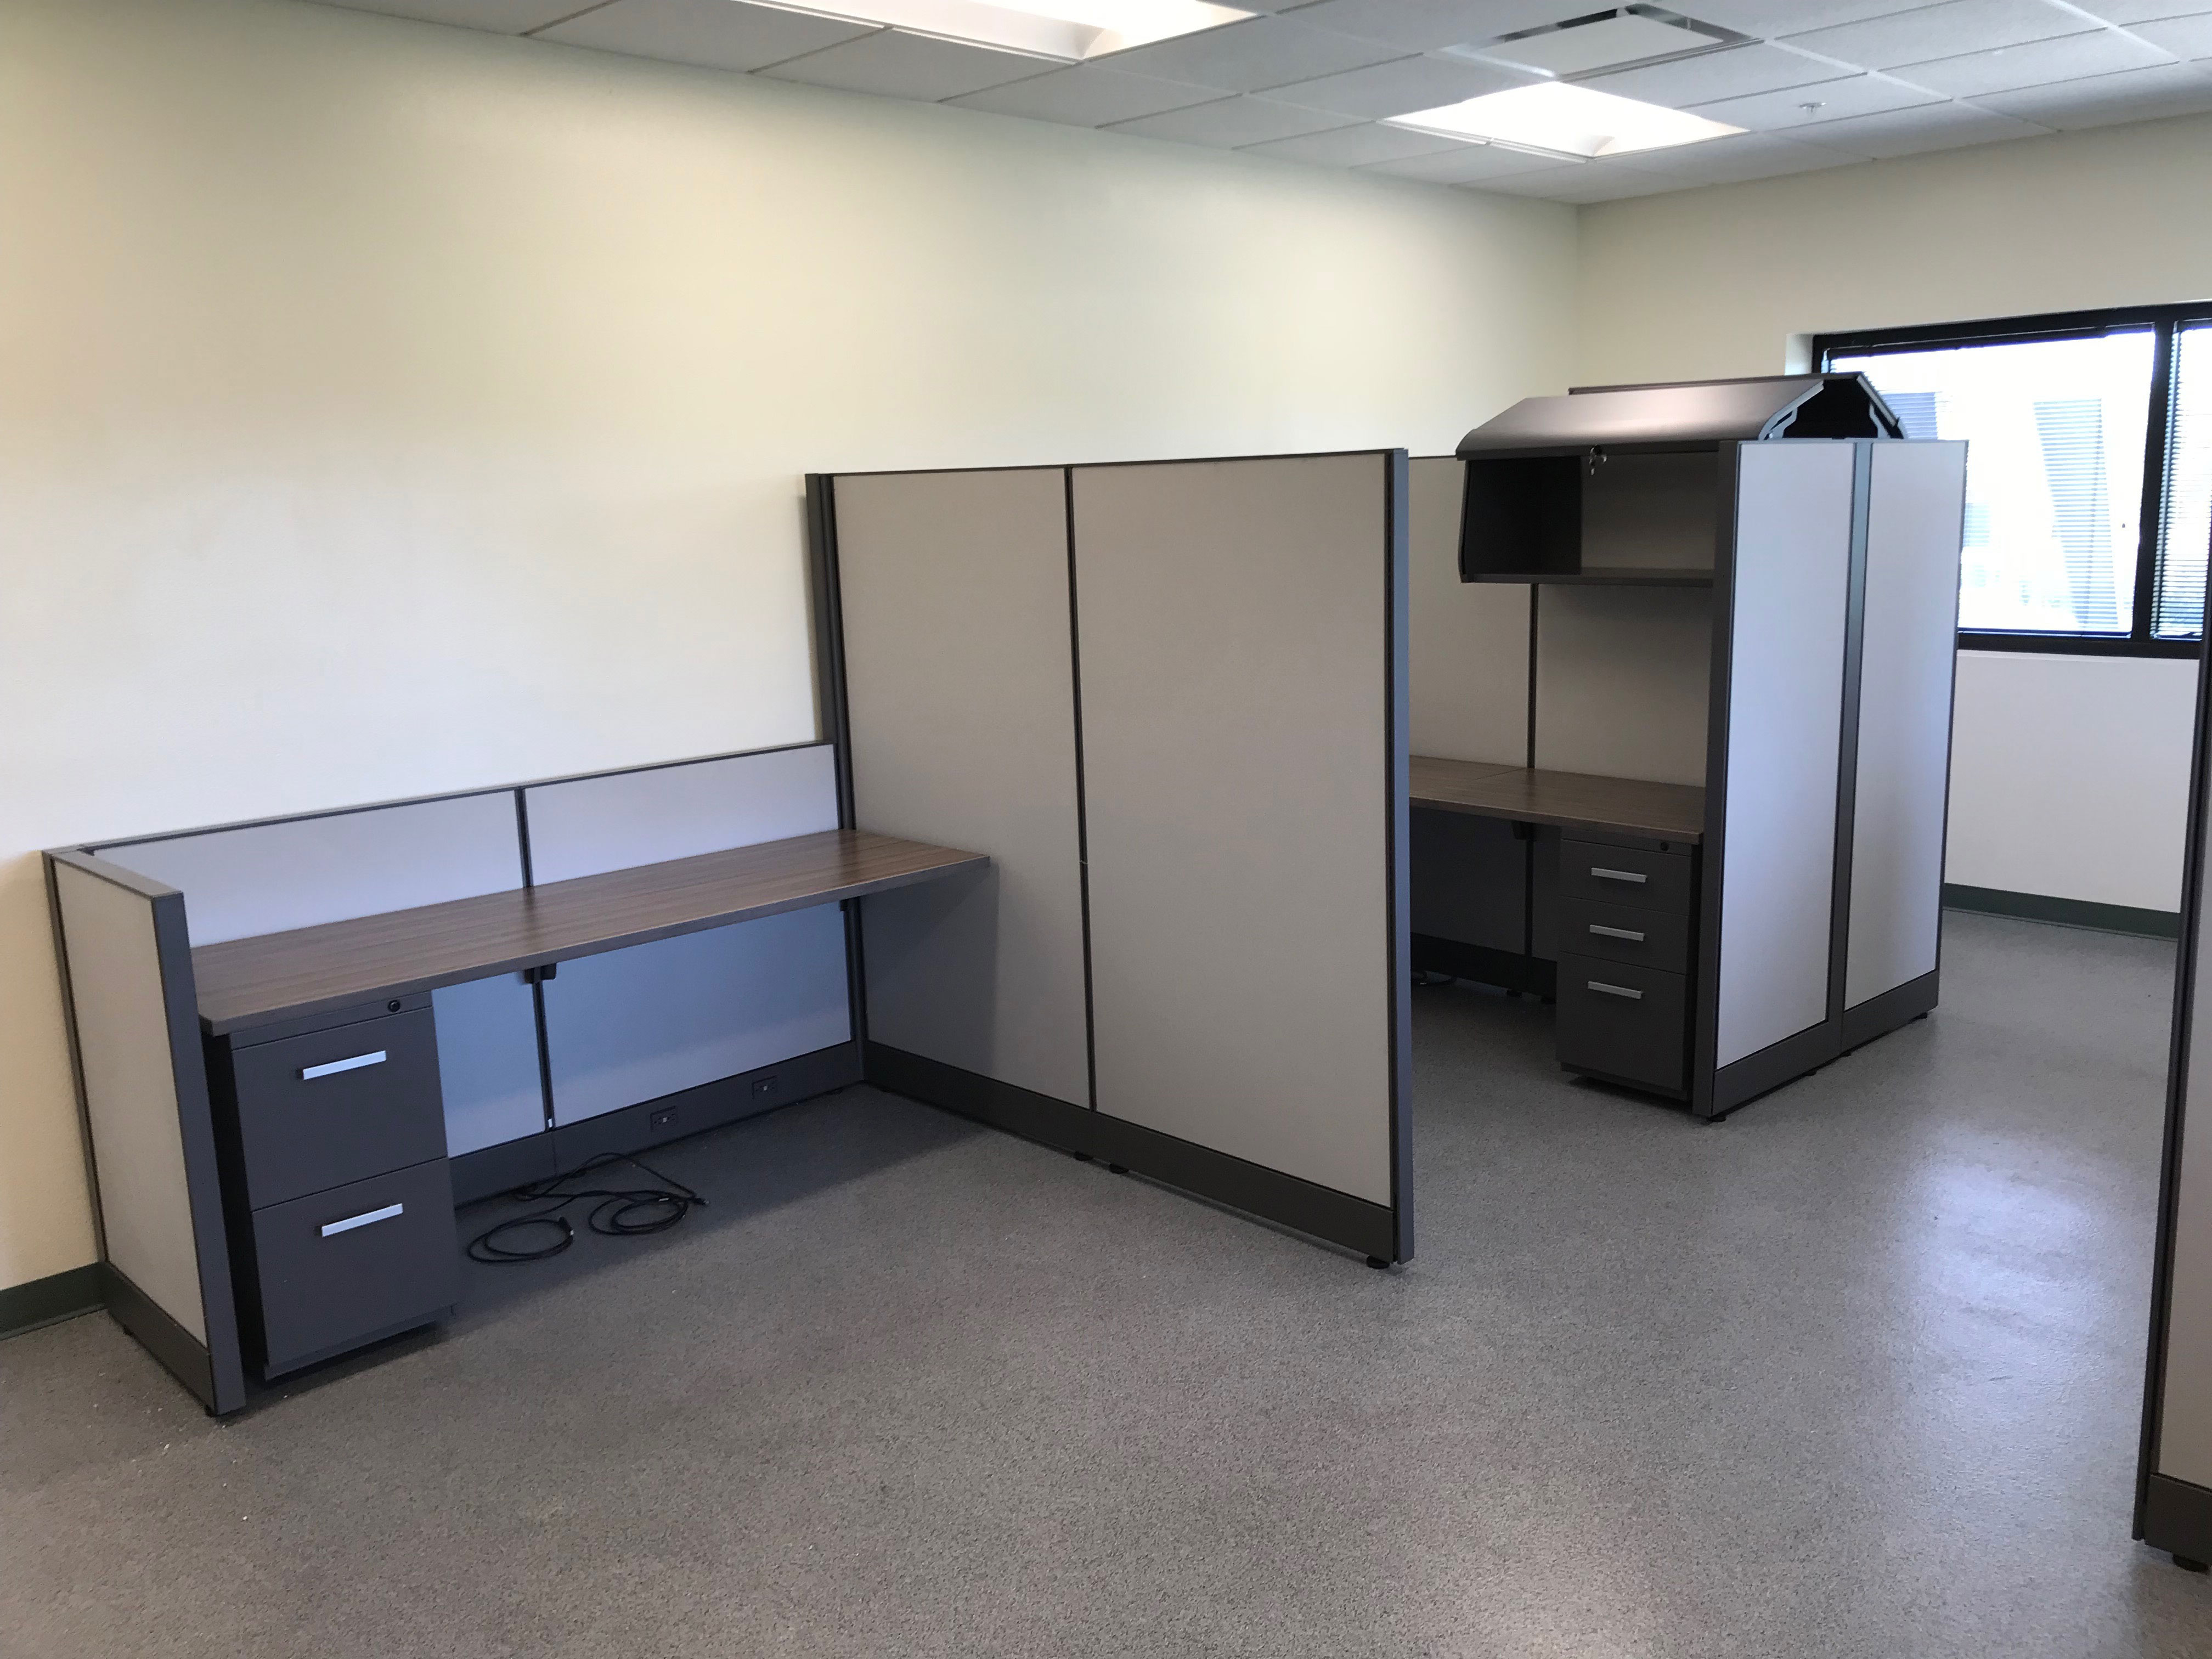 office-cubicles-for-sale-venice-florida-manasota-office-supplies-llc.jpg